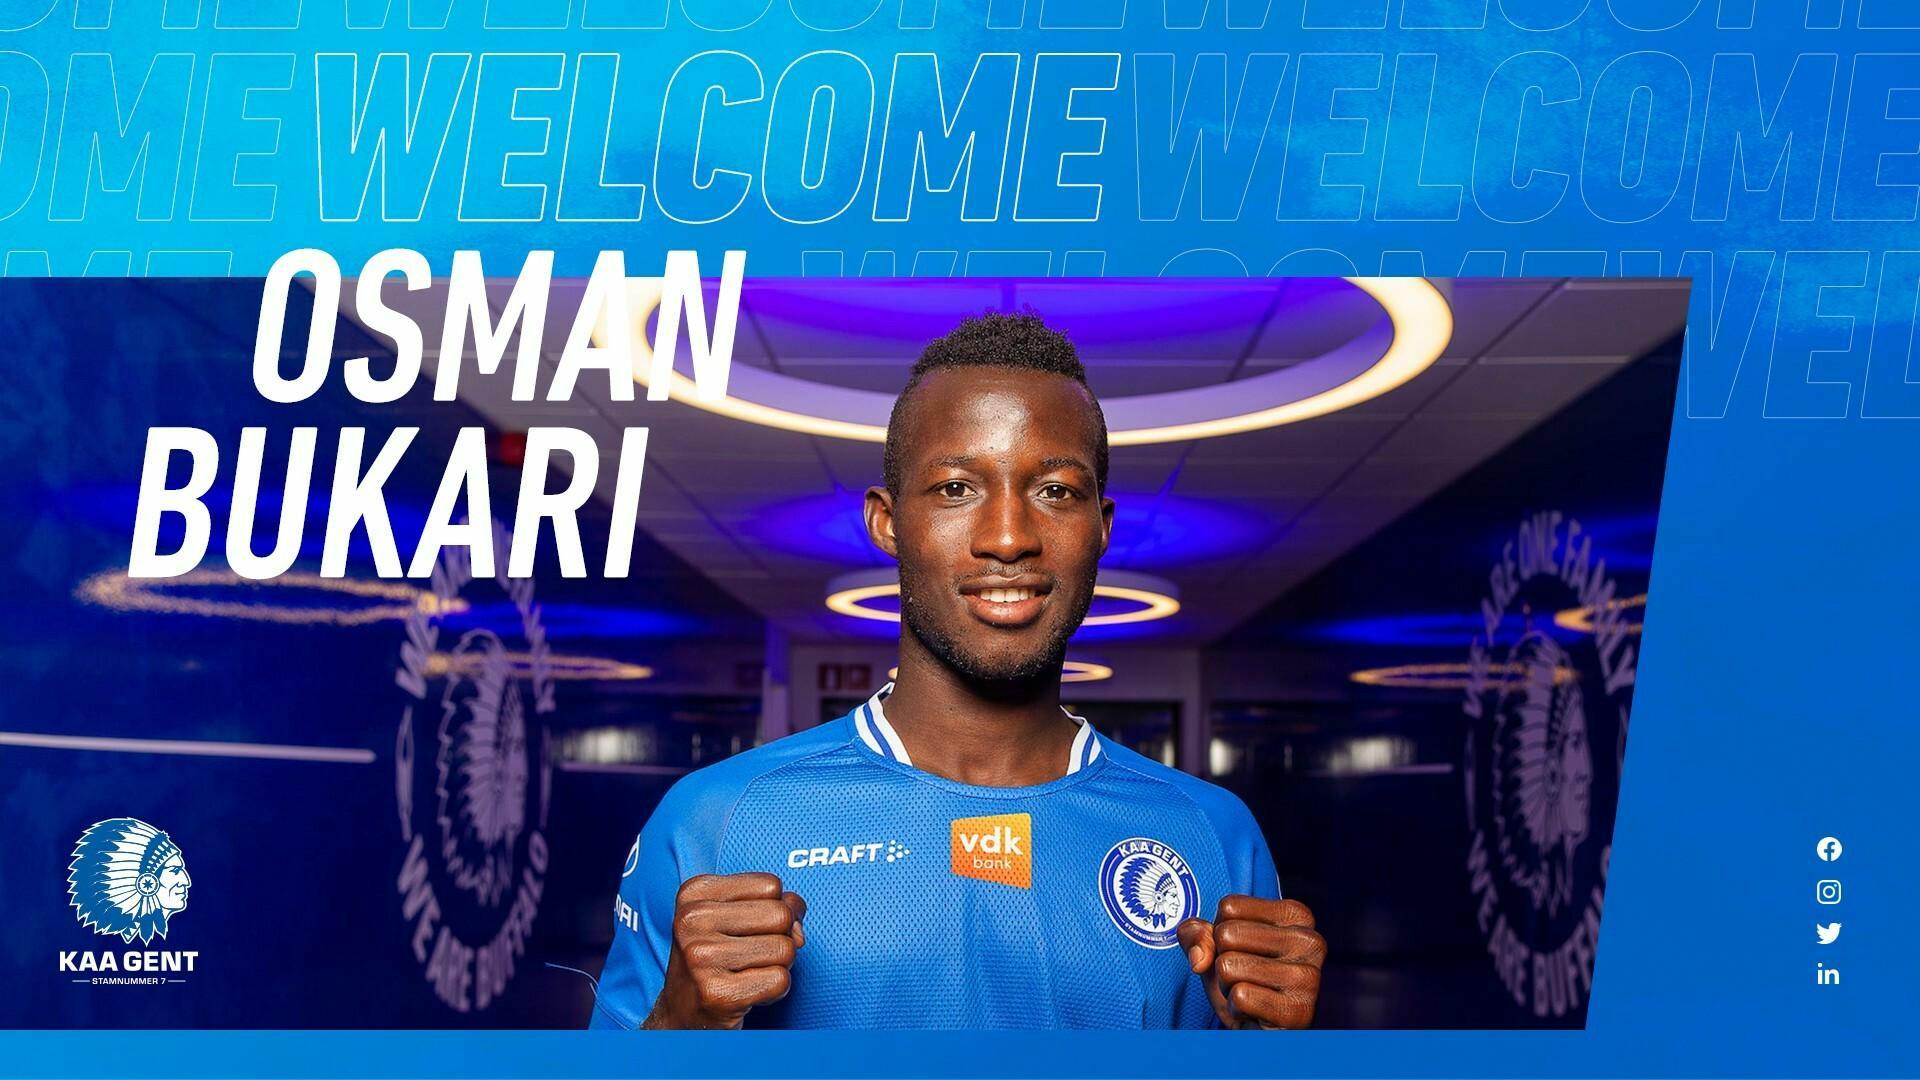 Welkom Osman!